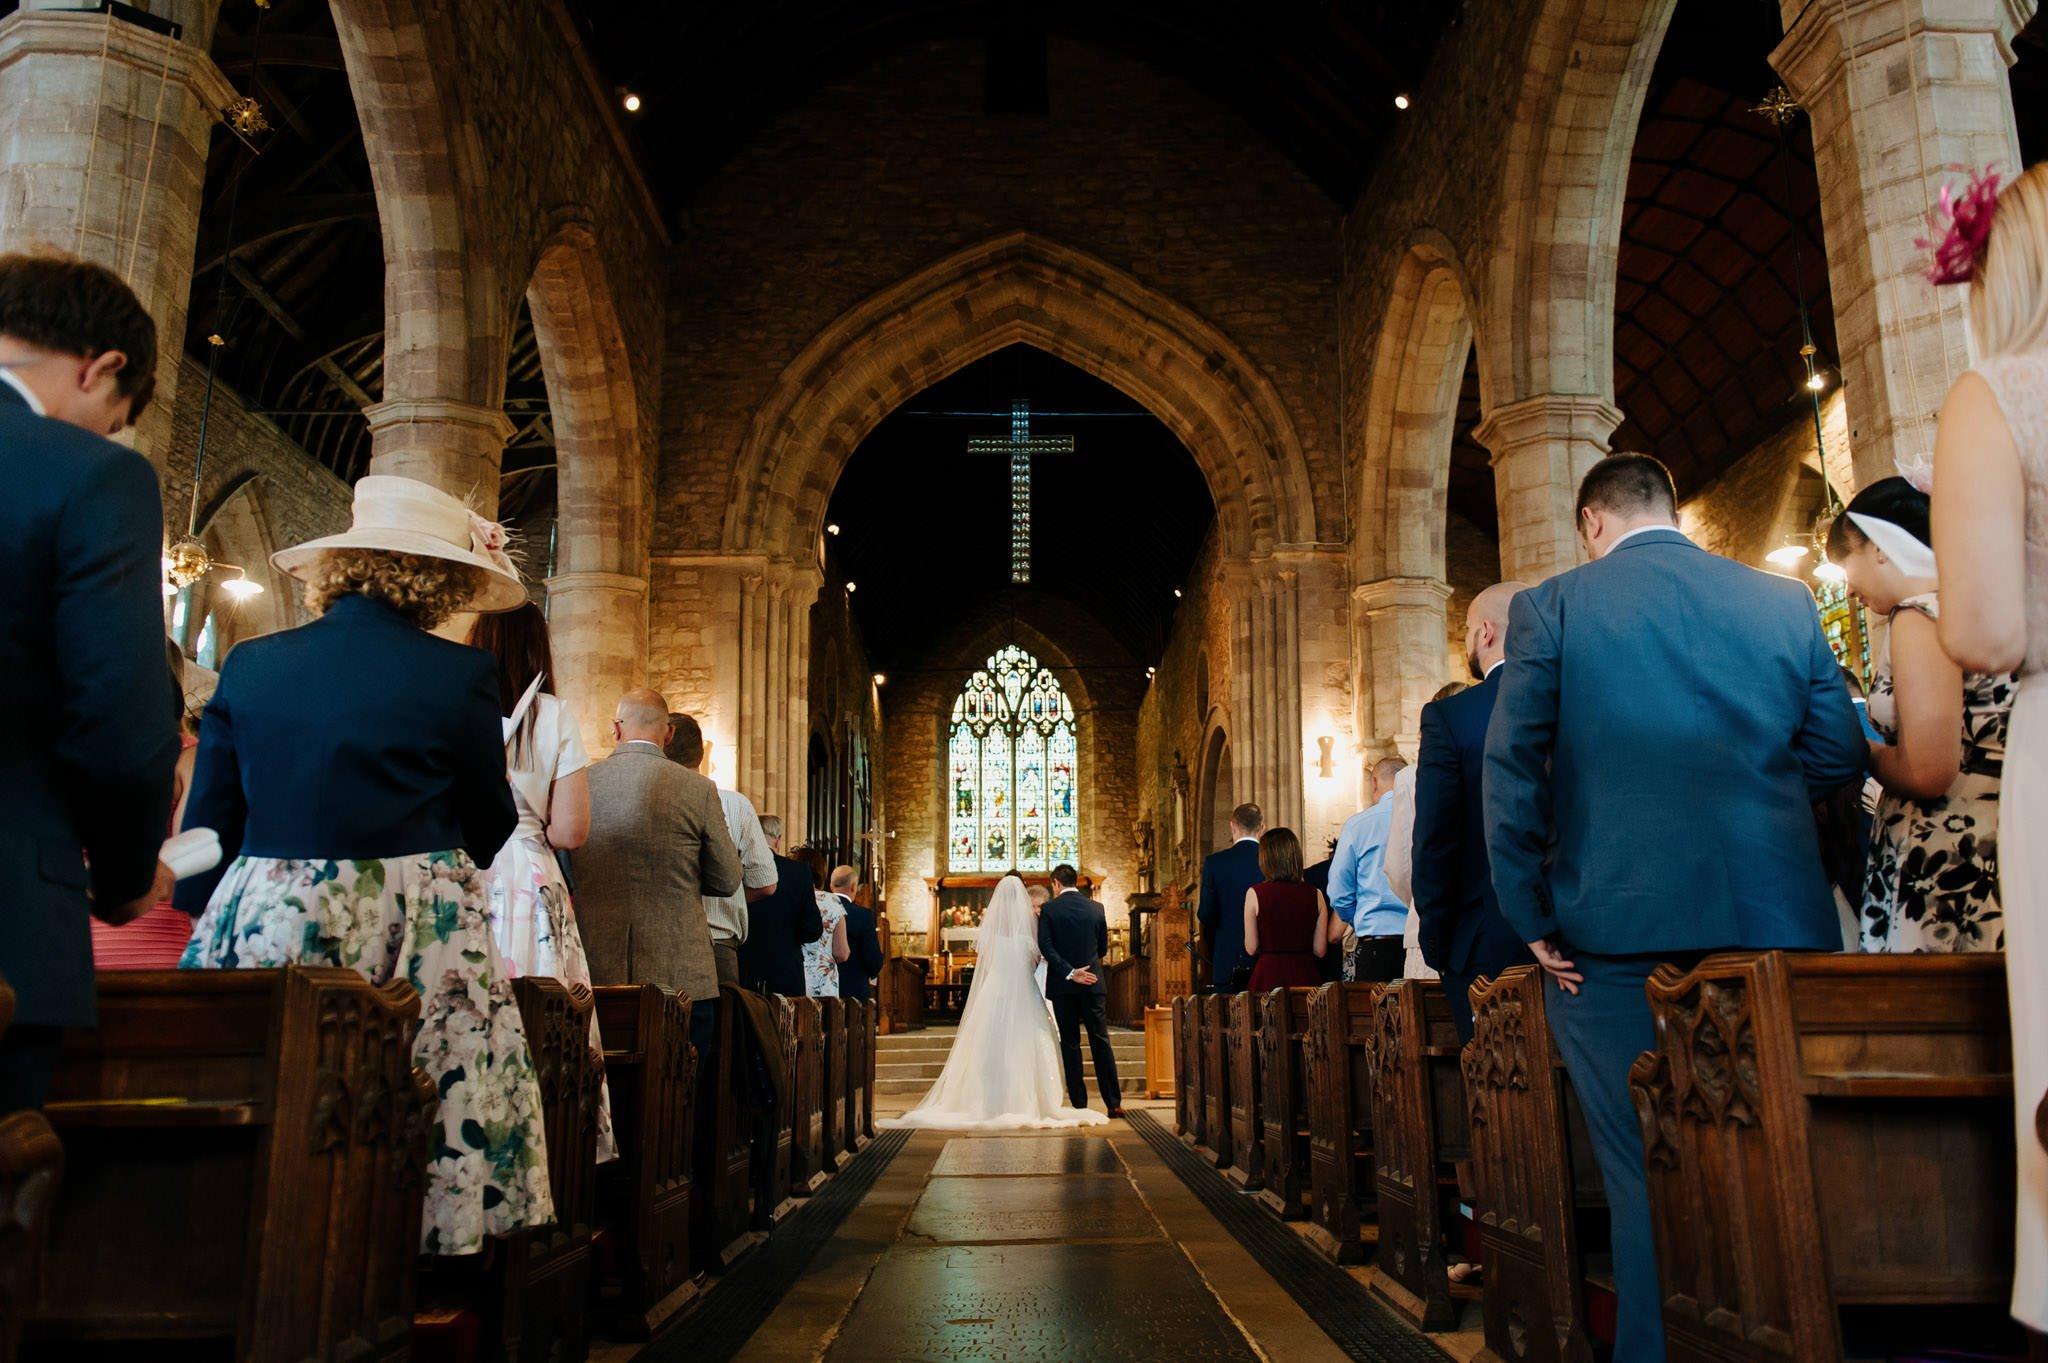 Eastnor Castle wedding photographer Herefordshire, West Midlands - Sarah + Dean 26